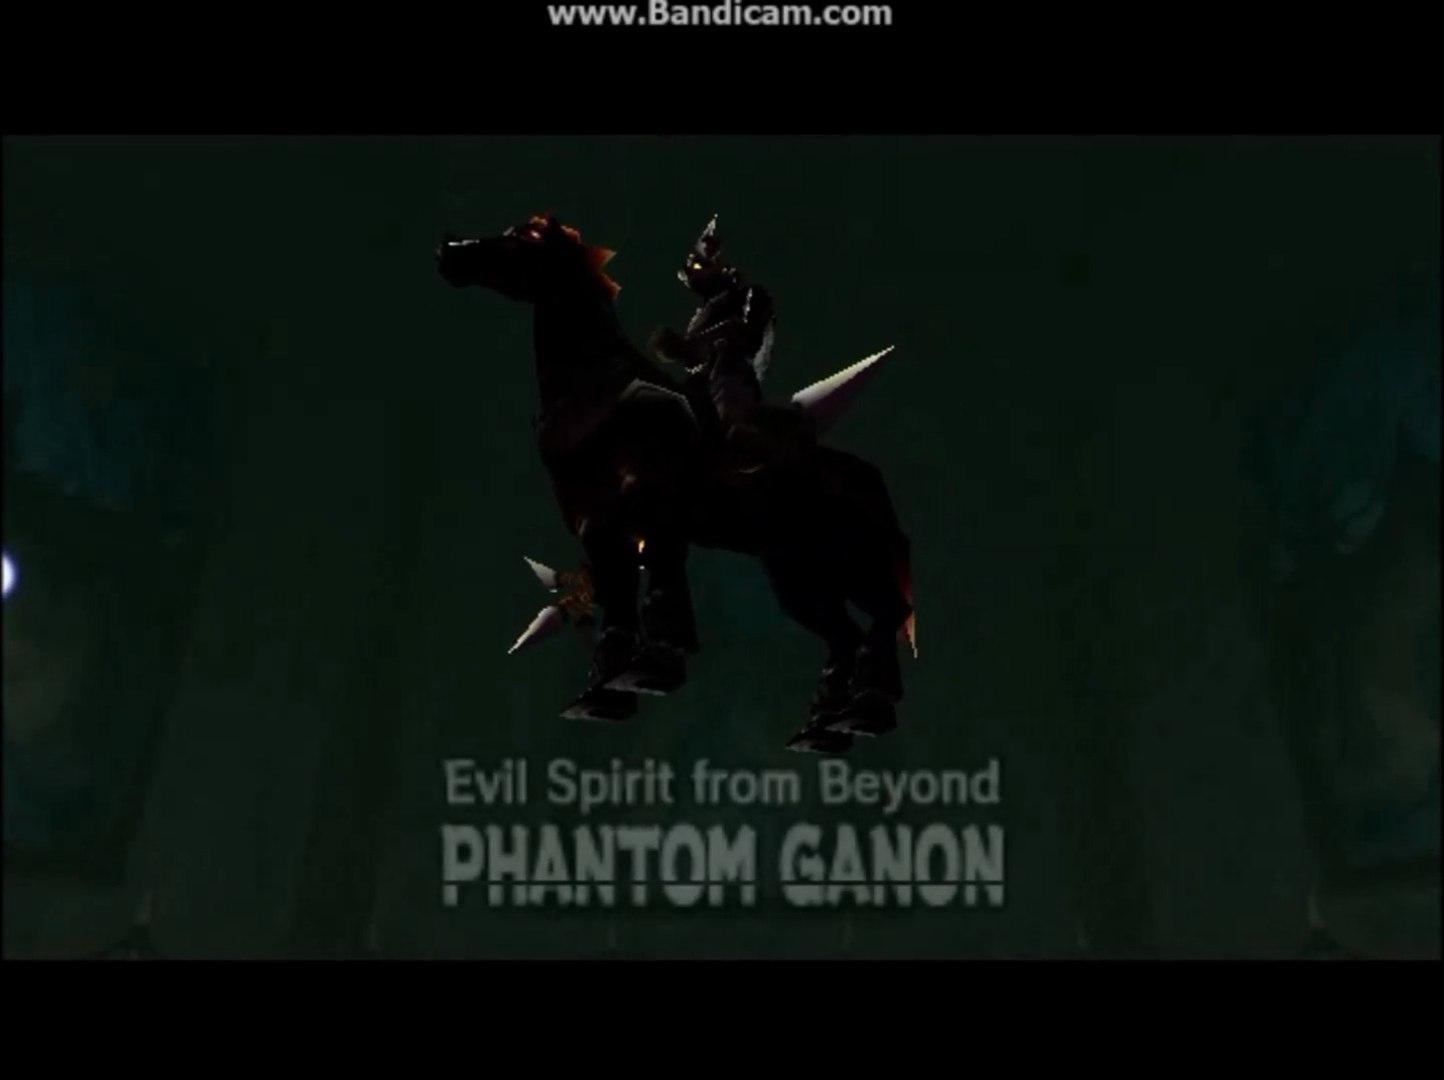 The Legend Of Zelda Ocarina Of Time Walkthrough Episode 21 Phantom Ganon